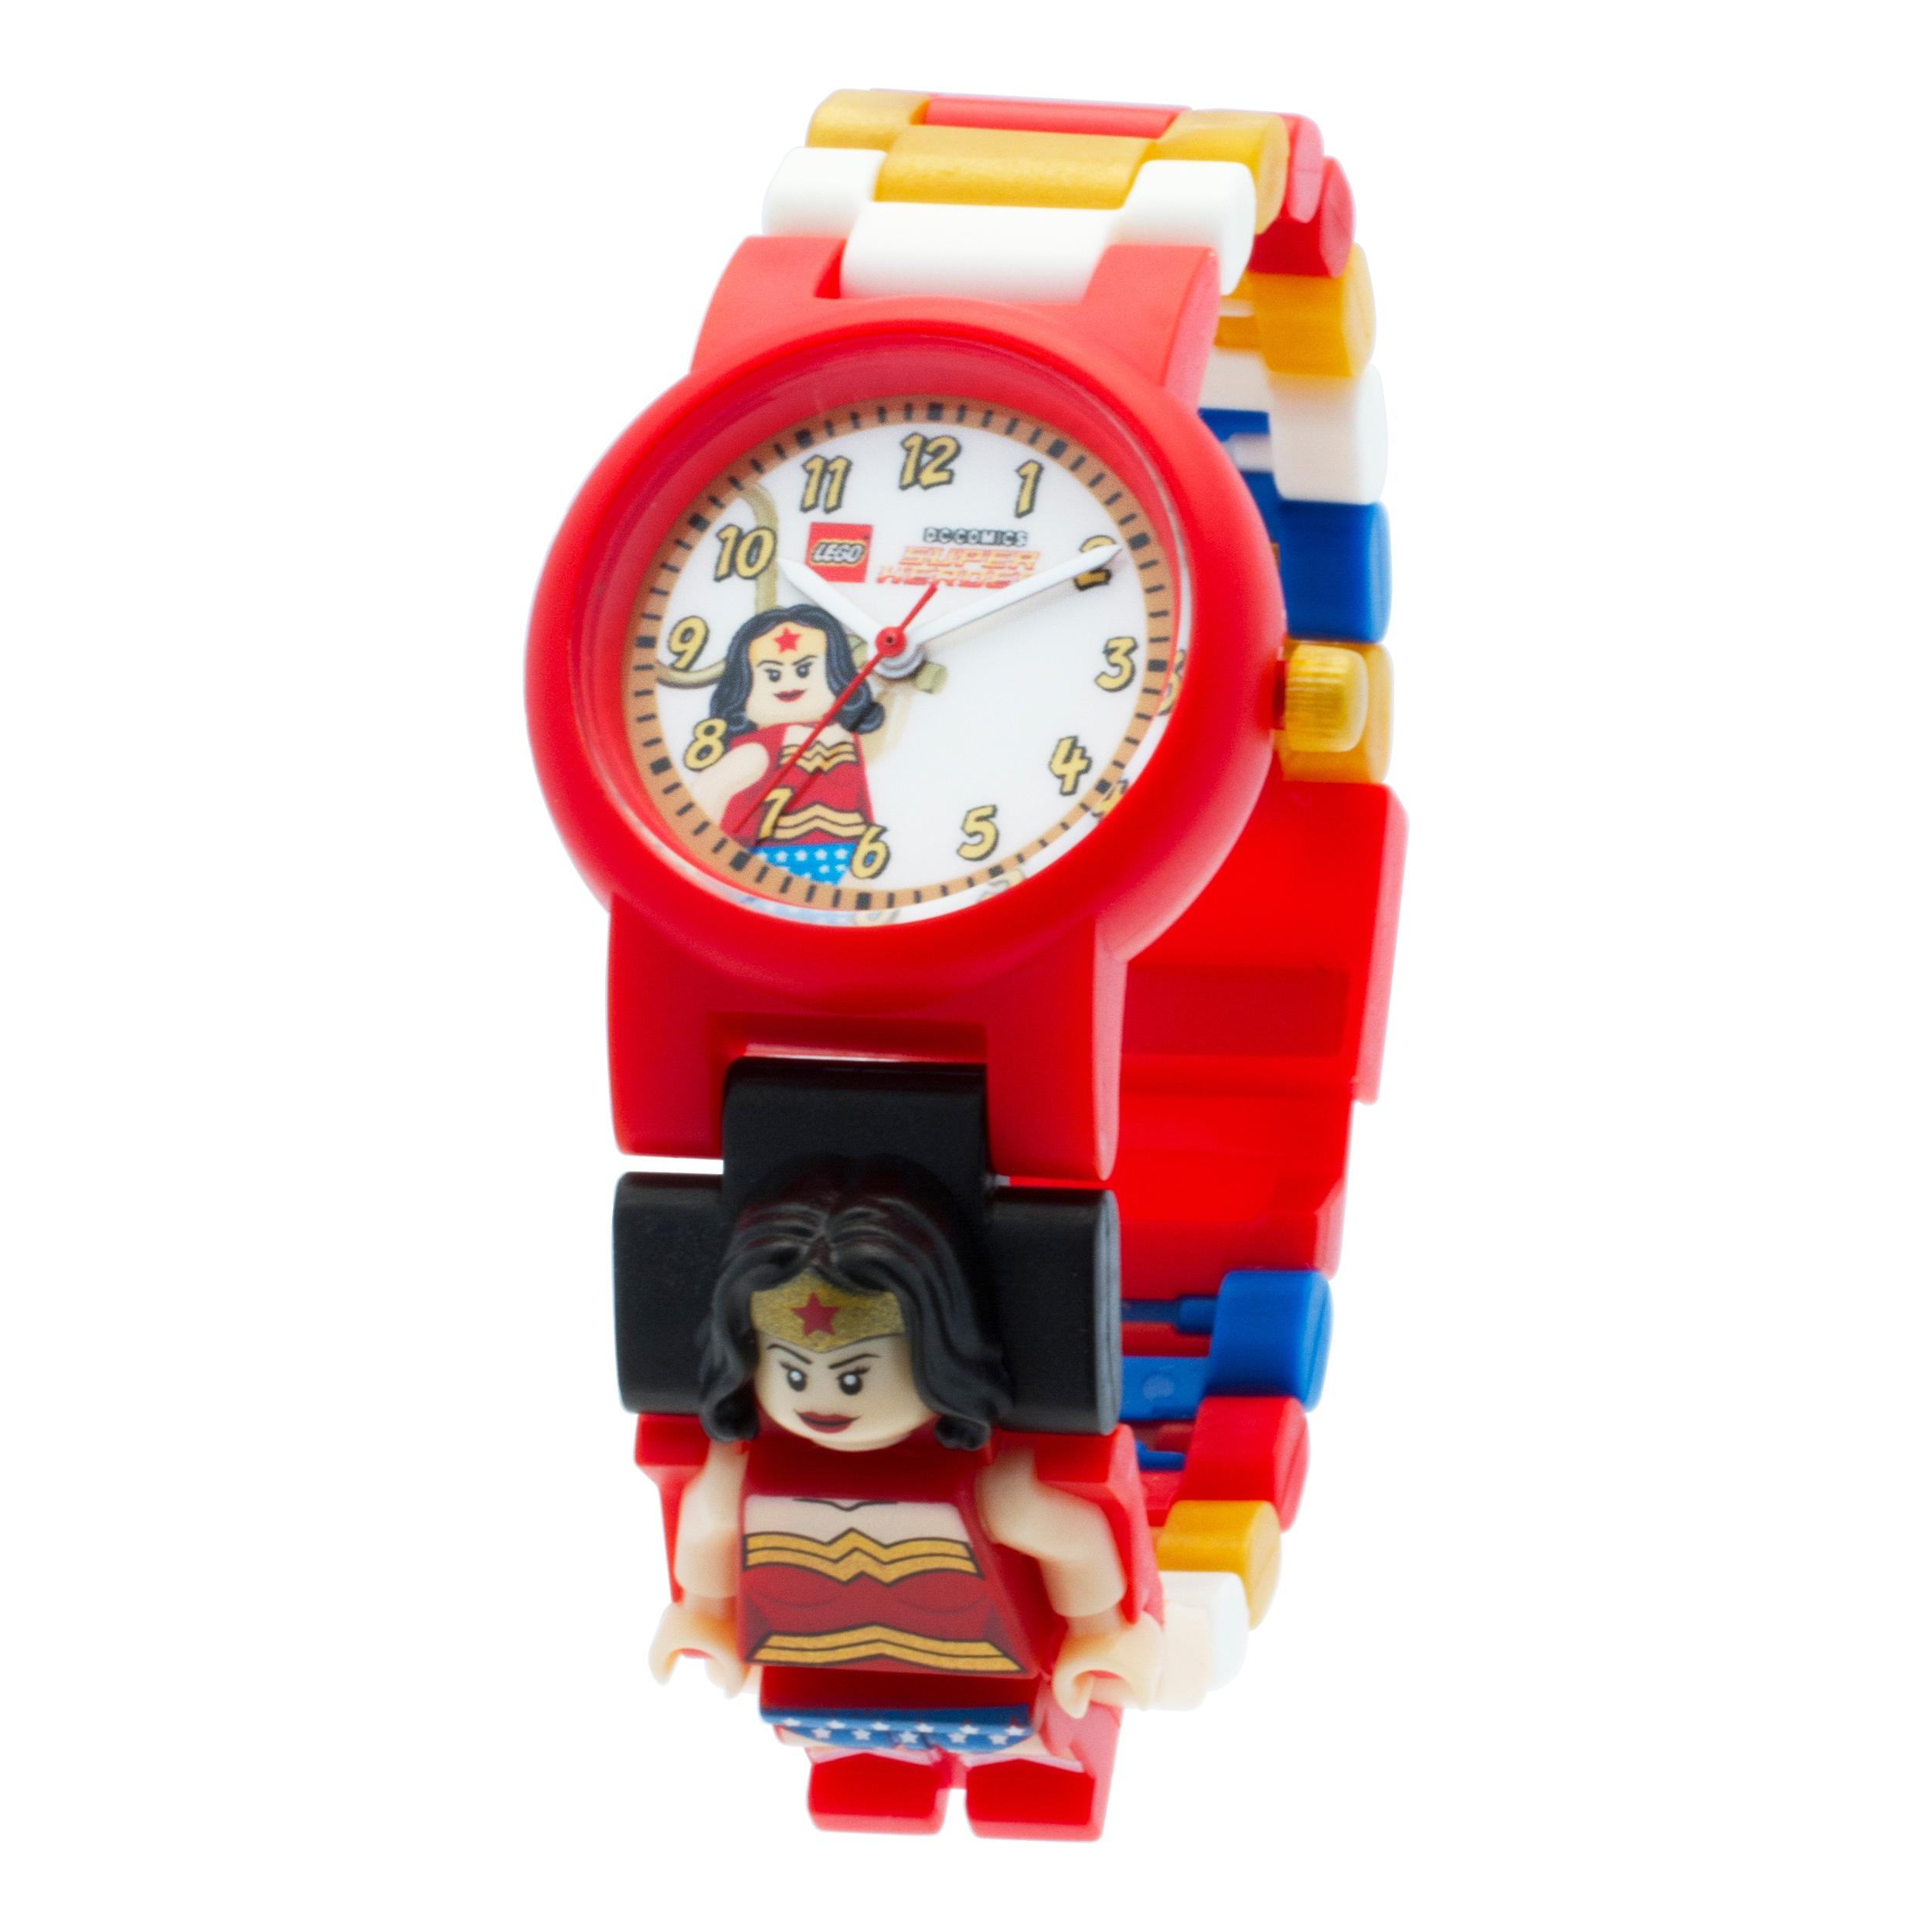 Lego DC Super Heroes 'Wonder Woman' Kid's Minifigure Inte...